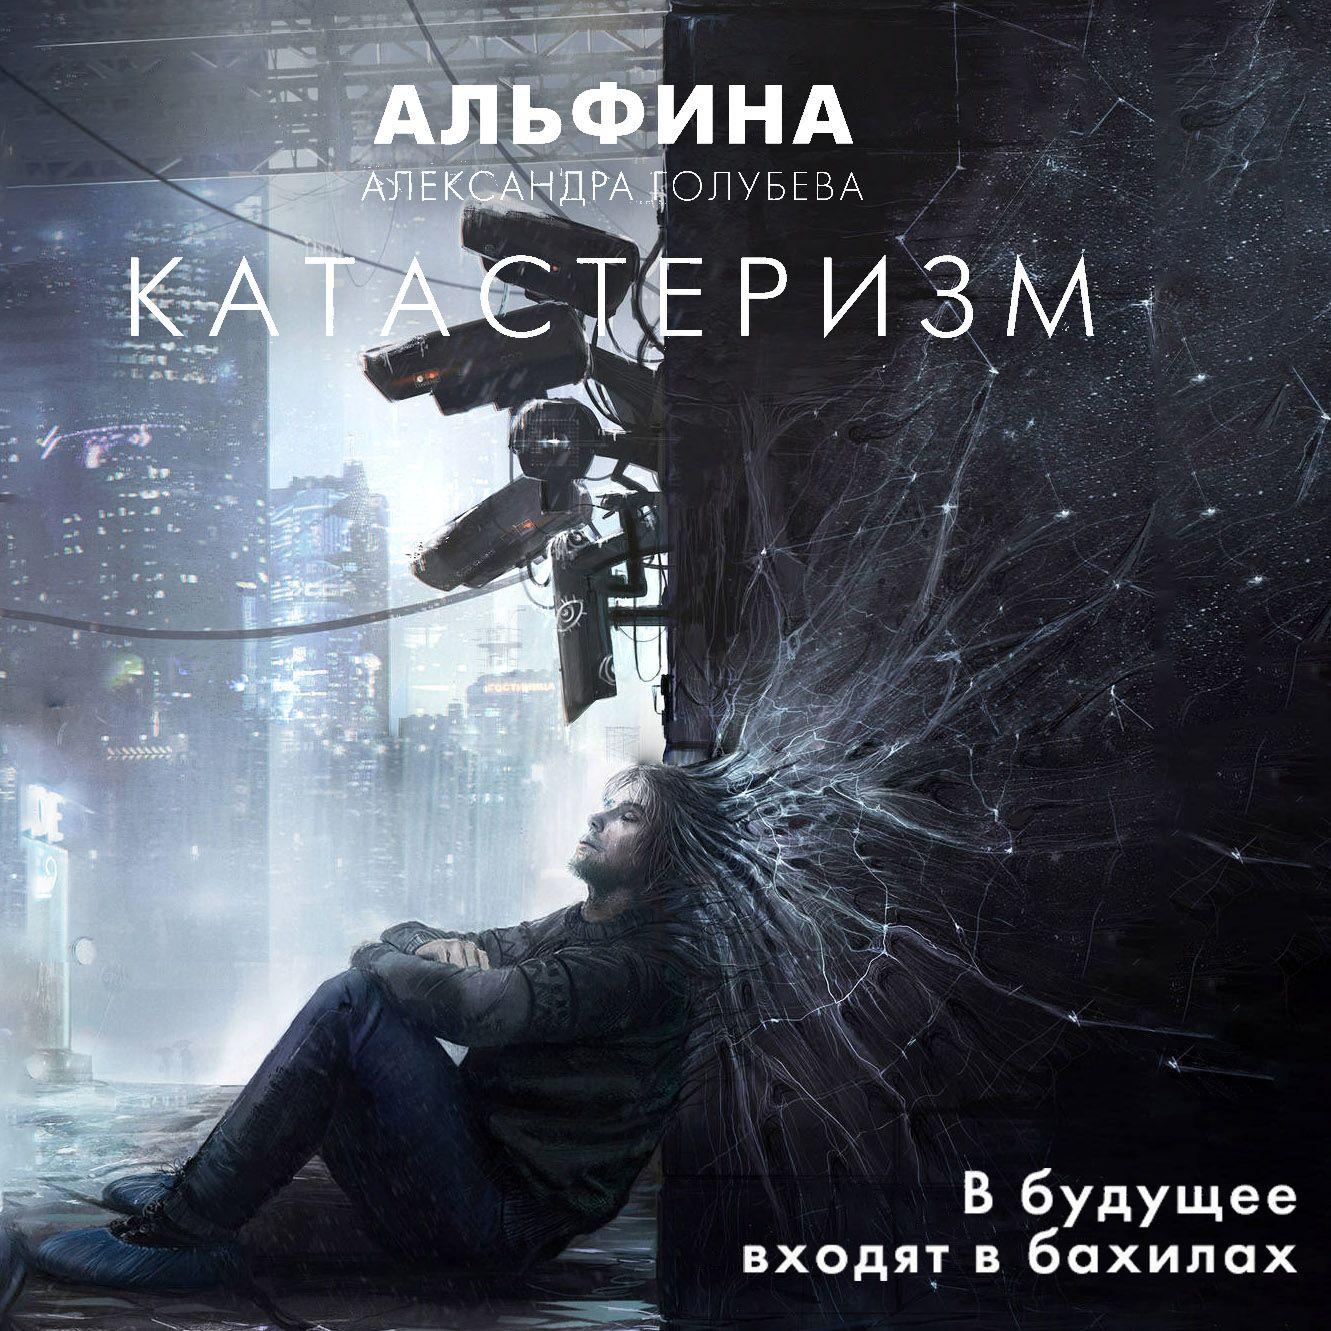 Александра «Альфина» Голубева Катастеризм